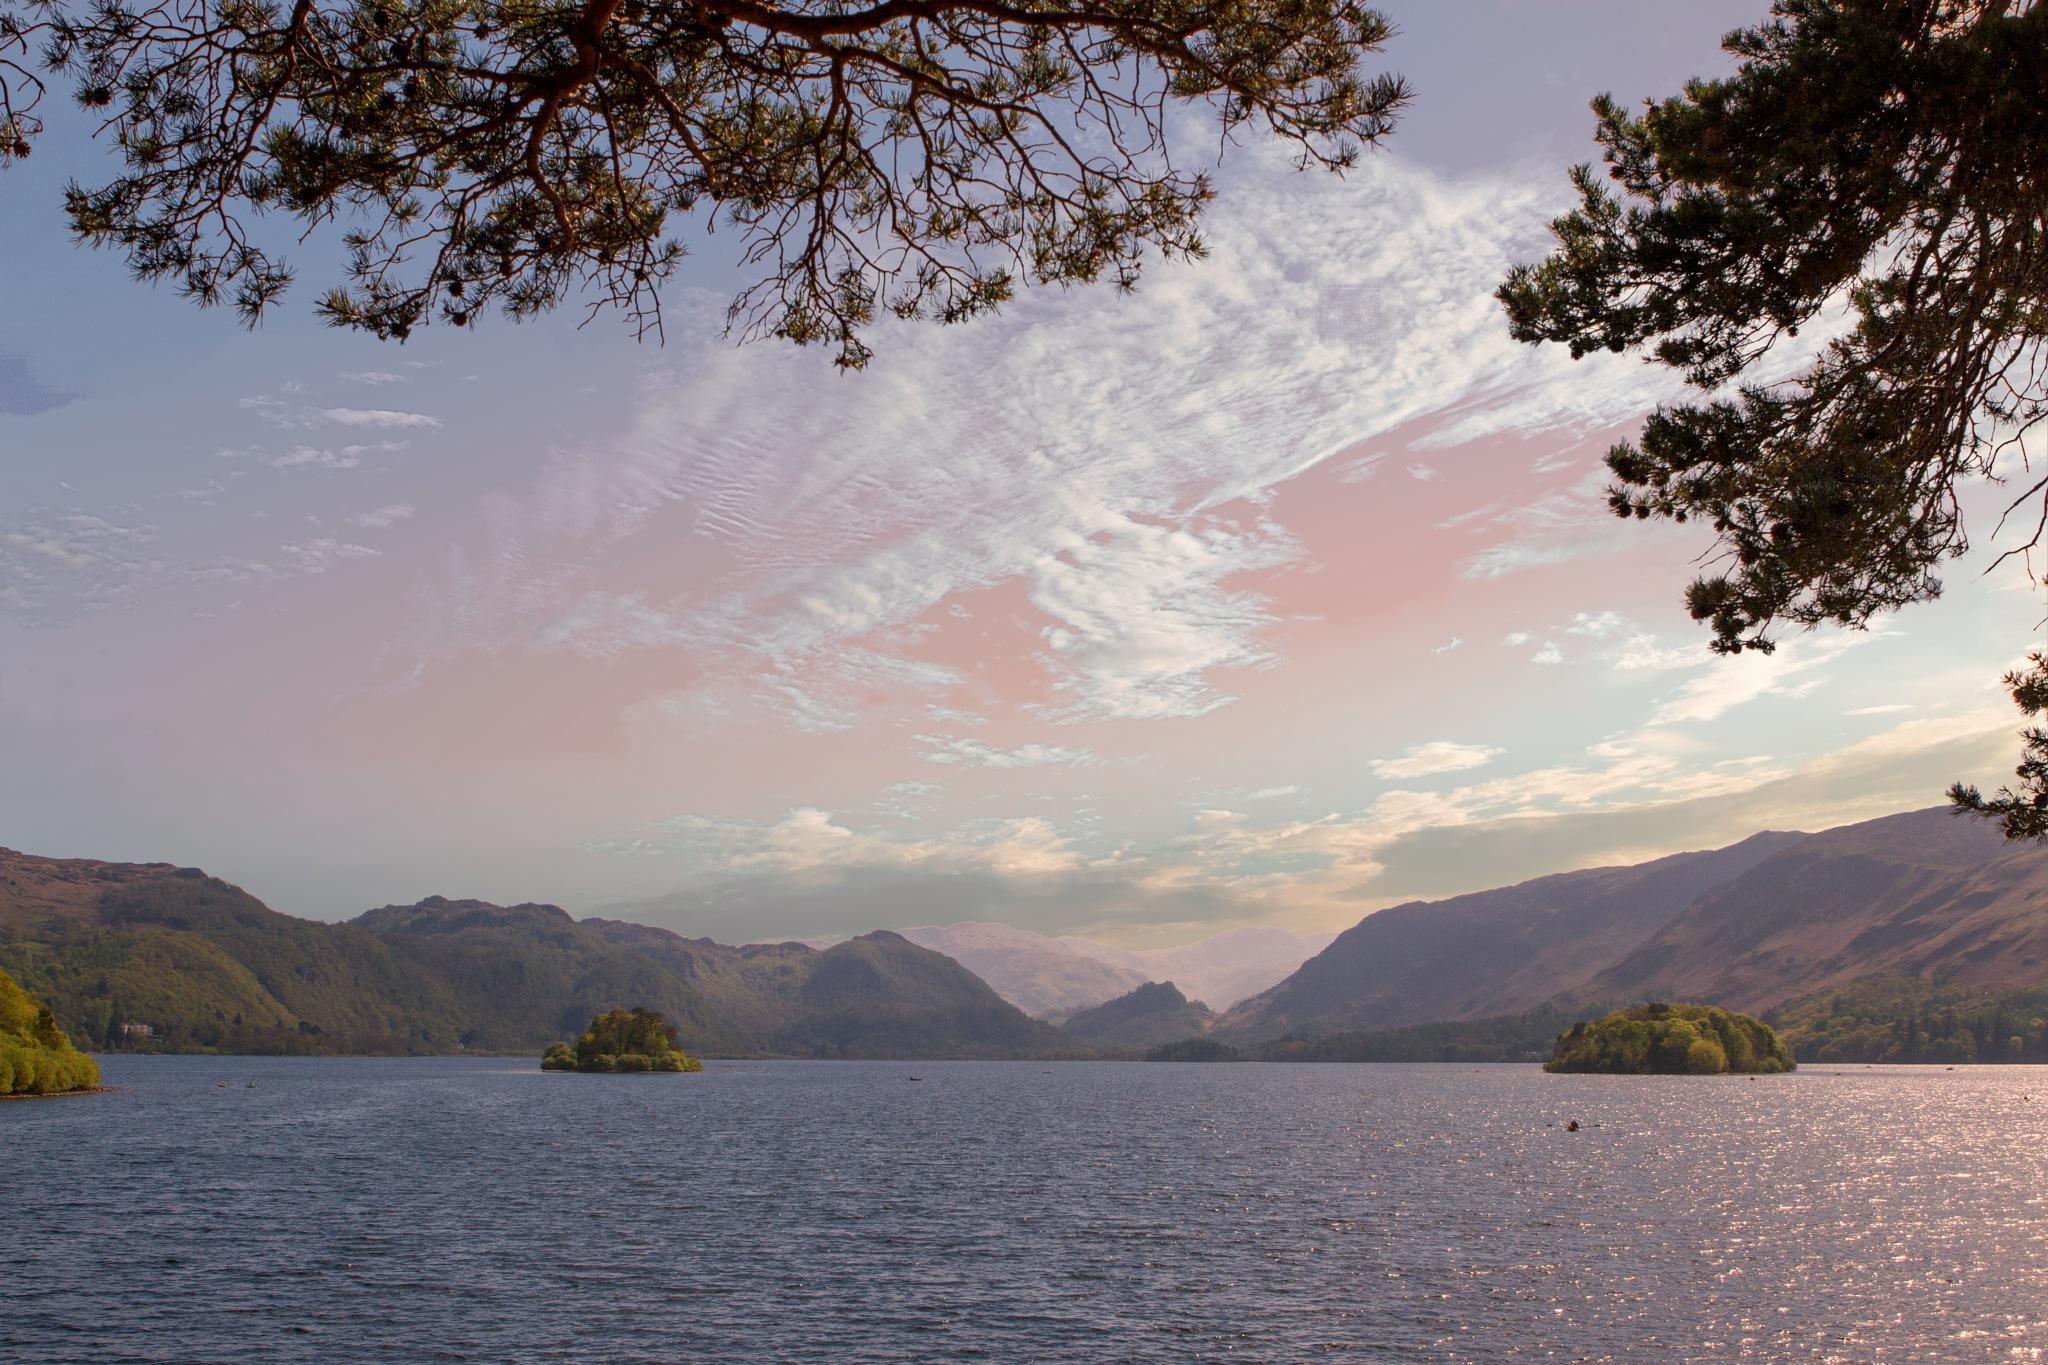 Derwent Water, Lake District UK by Andrew Walpole